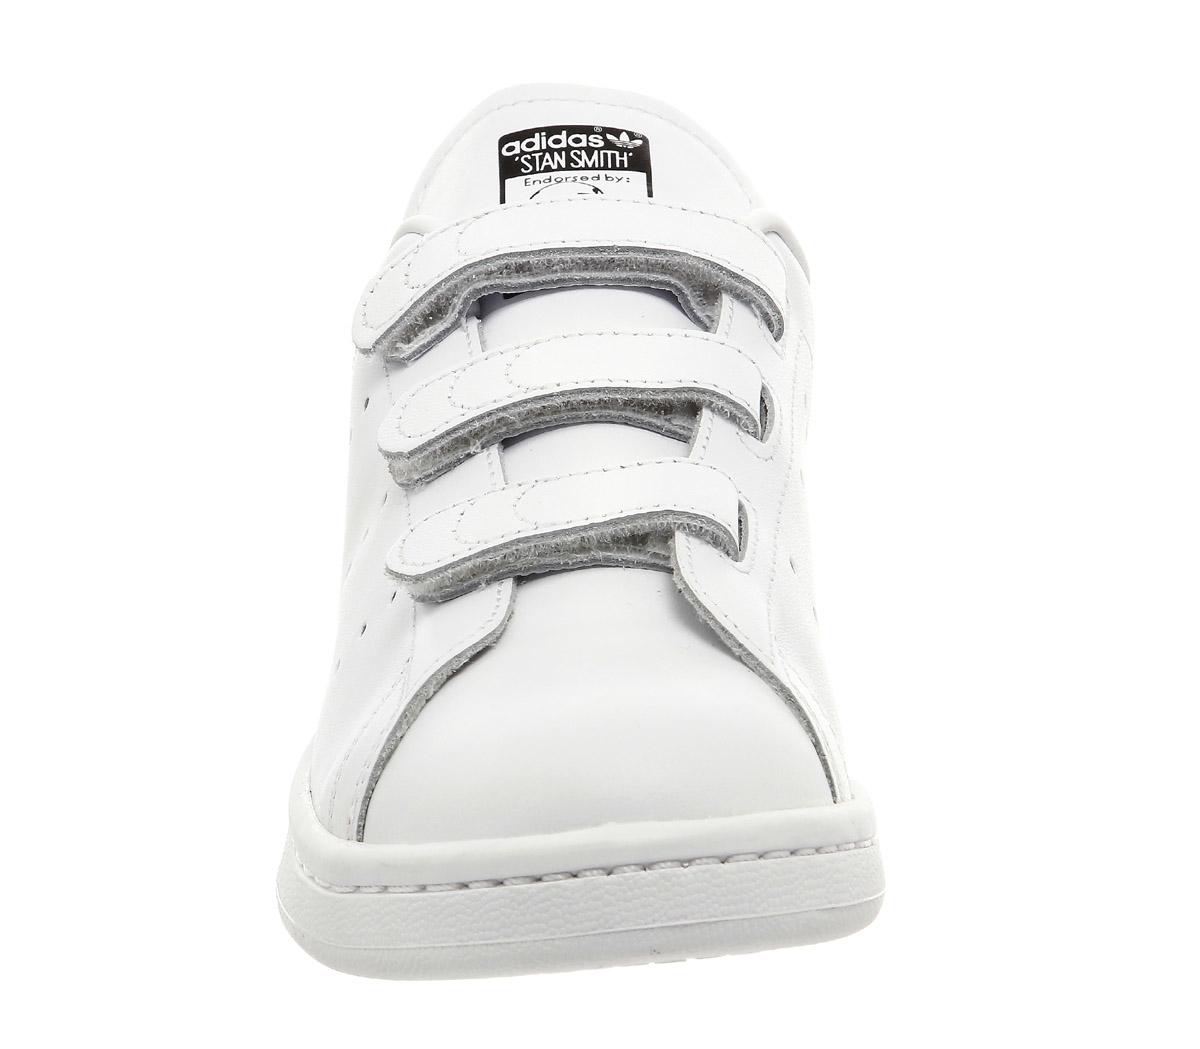 buy online 6e5e8 16028 Womens Adidas Stan Smith ...